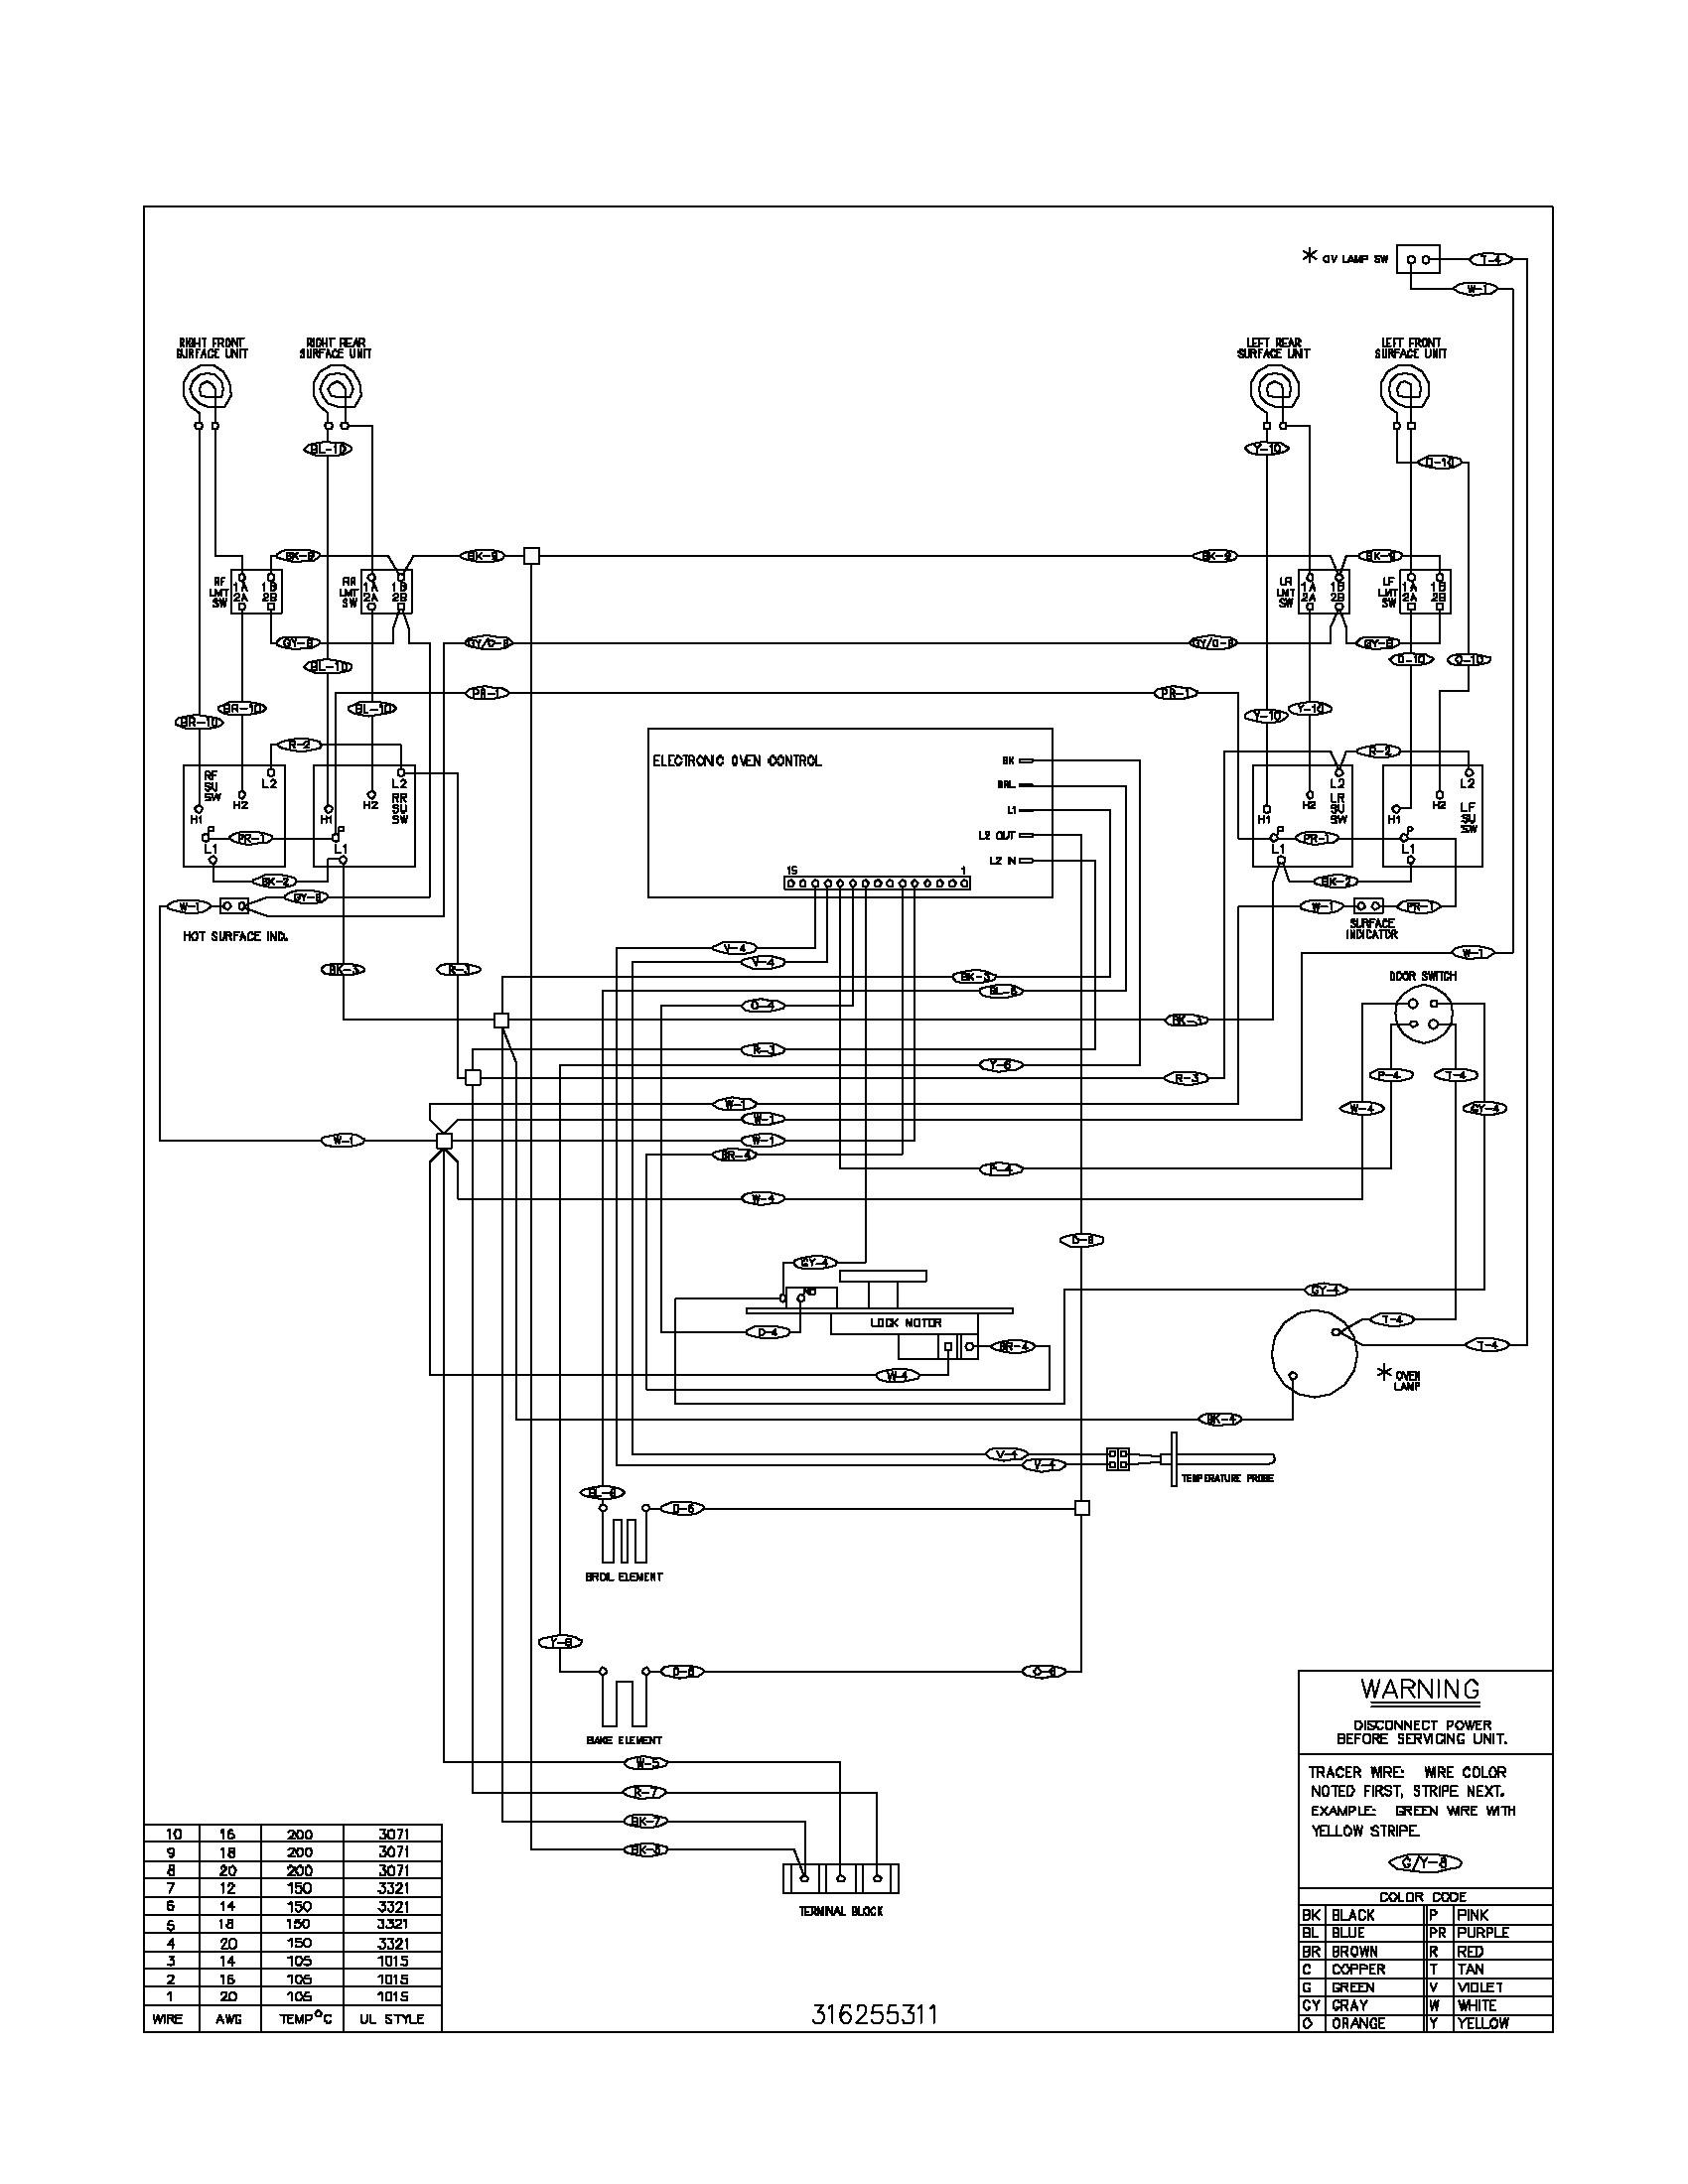 Ranges Electric Wiring Diagram Symbols - Wiring Diagrams on